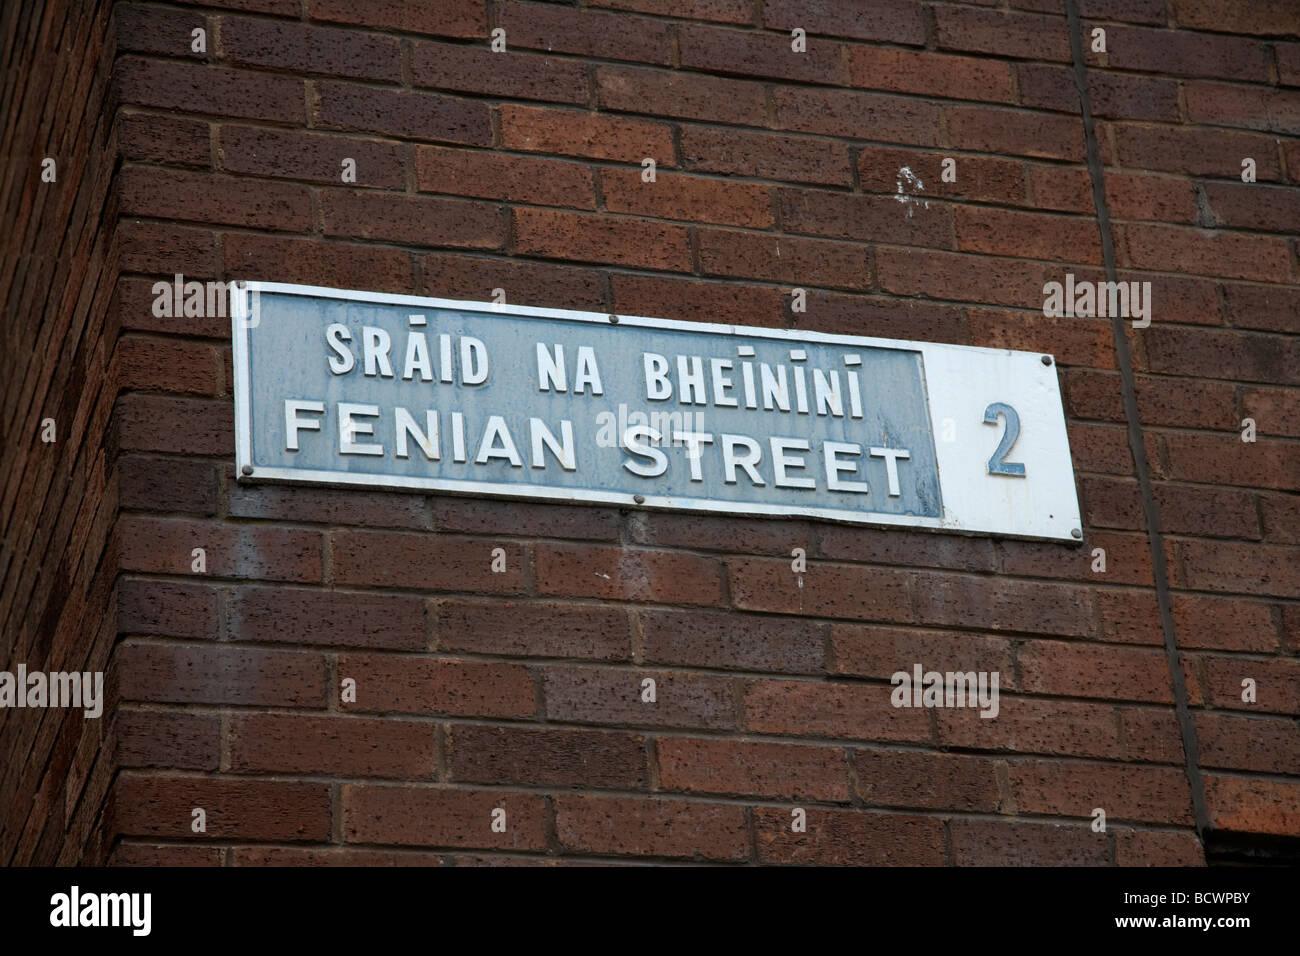 old bilingual street sign in english and irish for fenian street dublin 2 republic of ireland - Stock Image